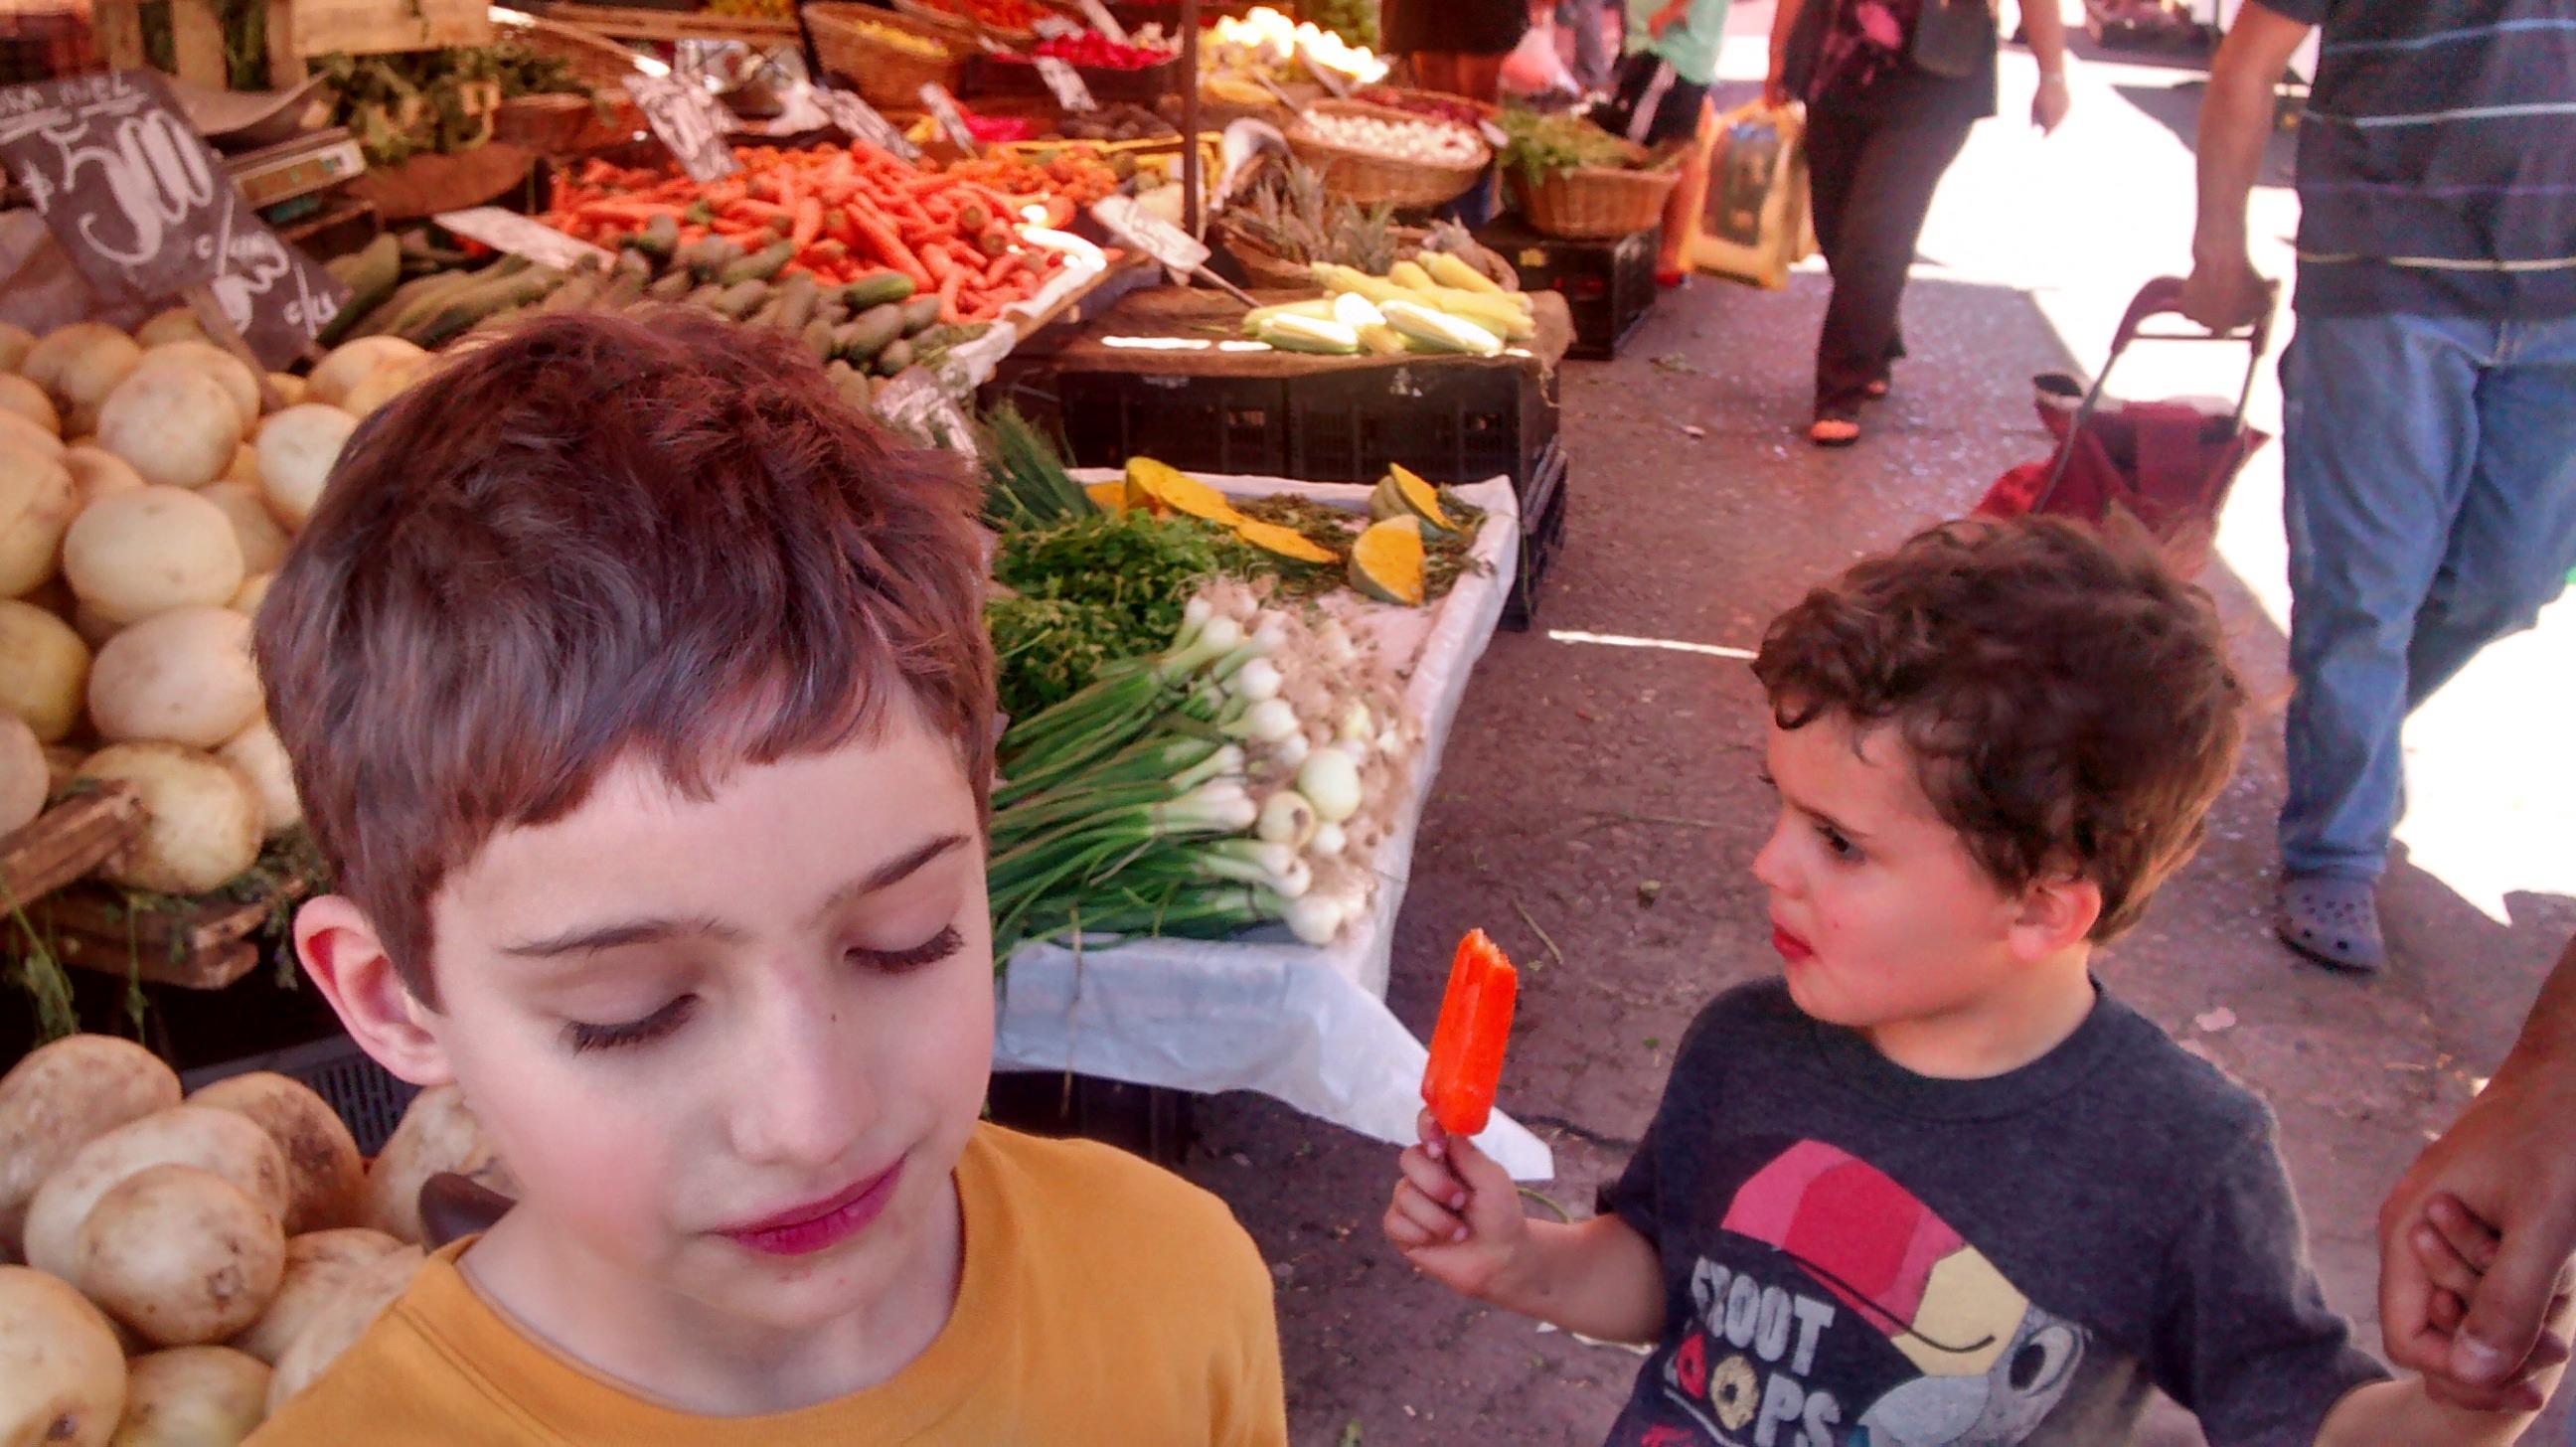 popsicle mercado--www.thethreeyearexperiment.com